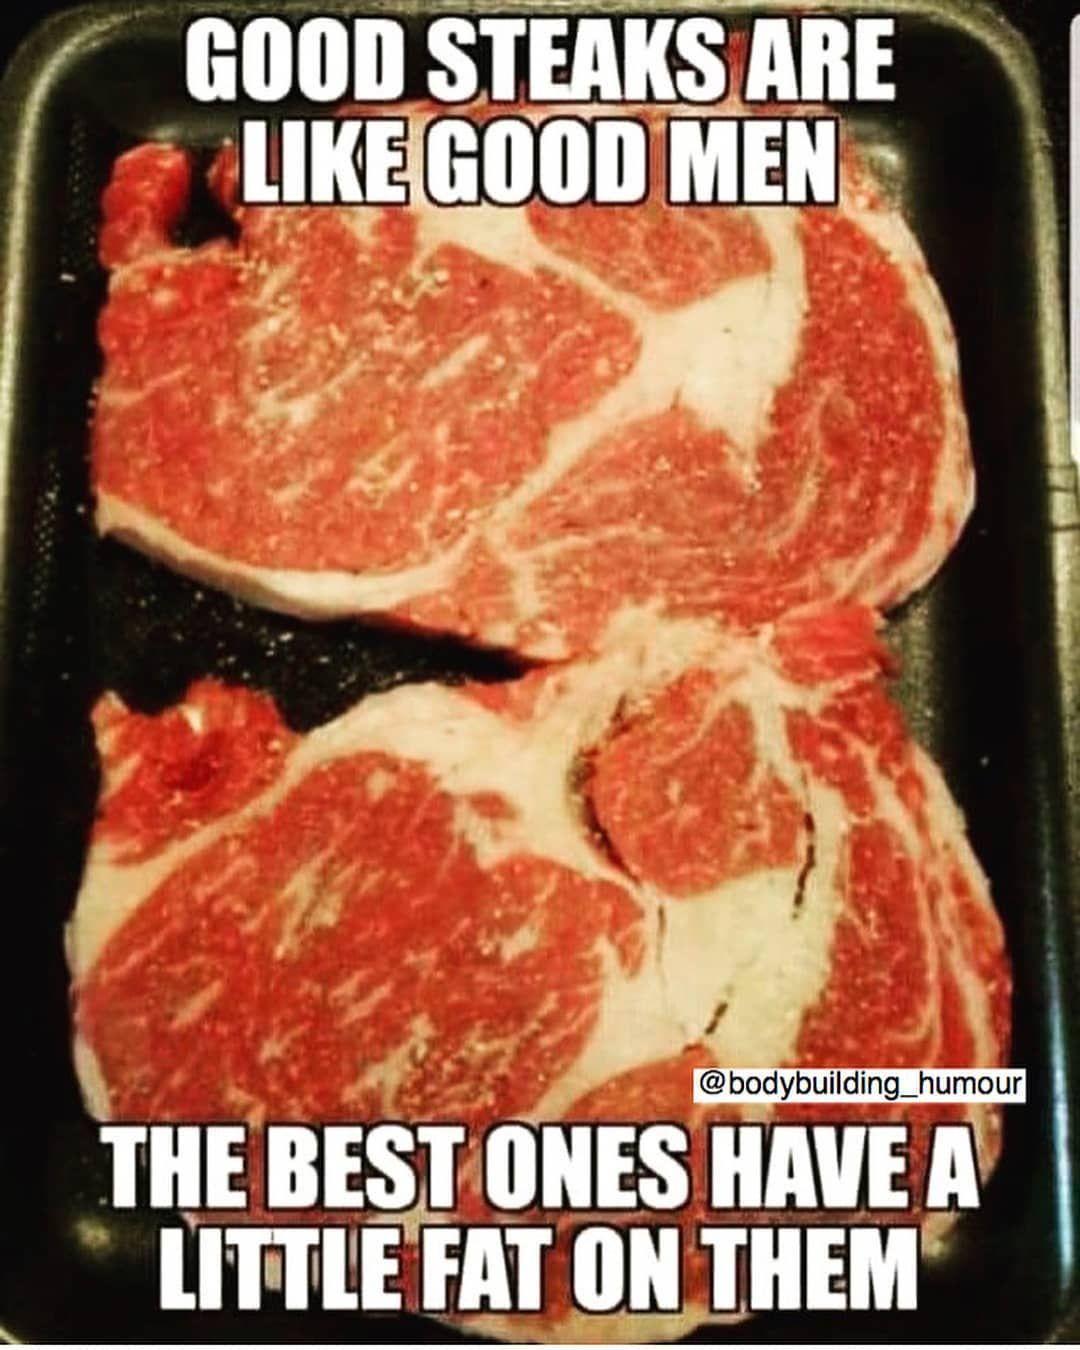 375 Likes 16 Comments Gym Rat Memes The Gym Rat On Instagram Truth The Unaturals Officials Unnaturals Best Steak Steaks Quotes Steak